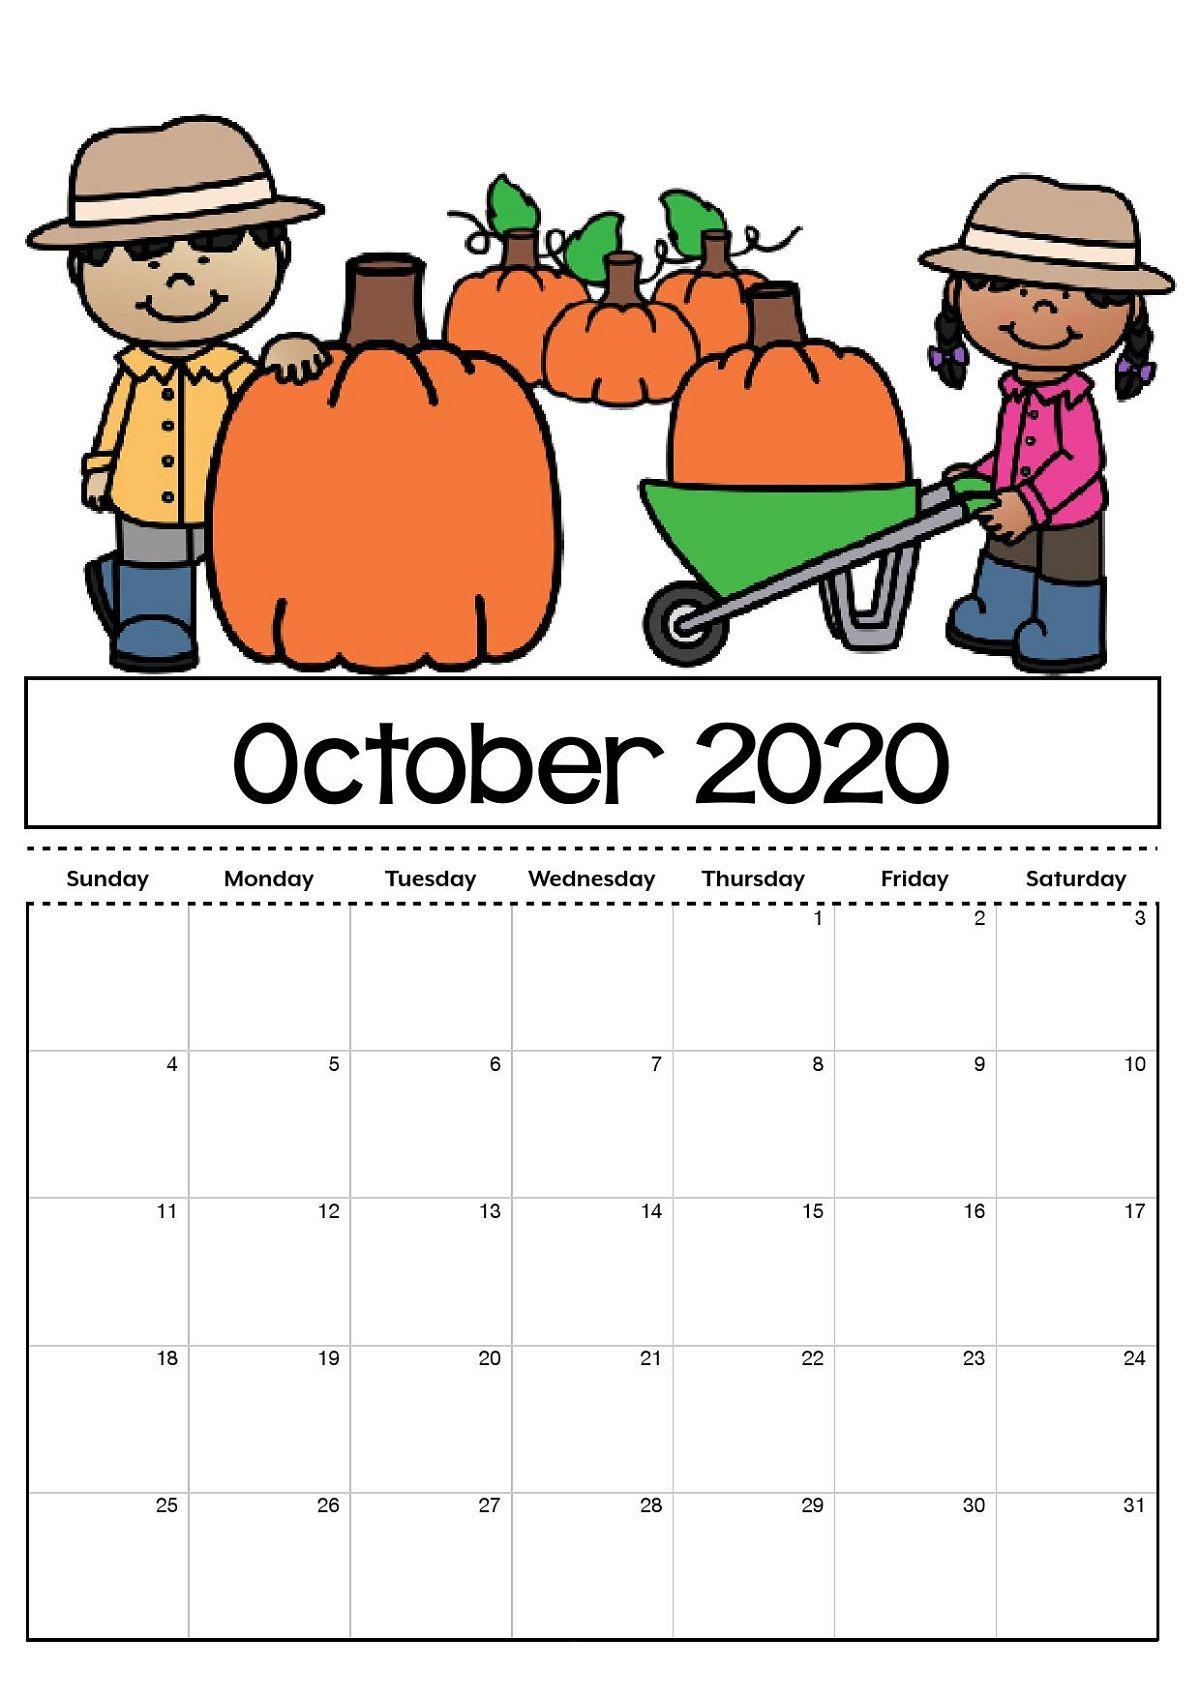 October Calendar For Kids In